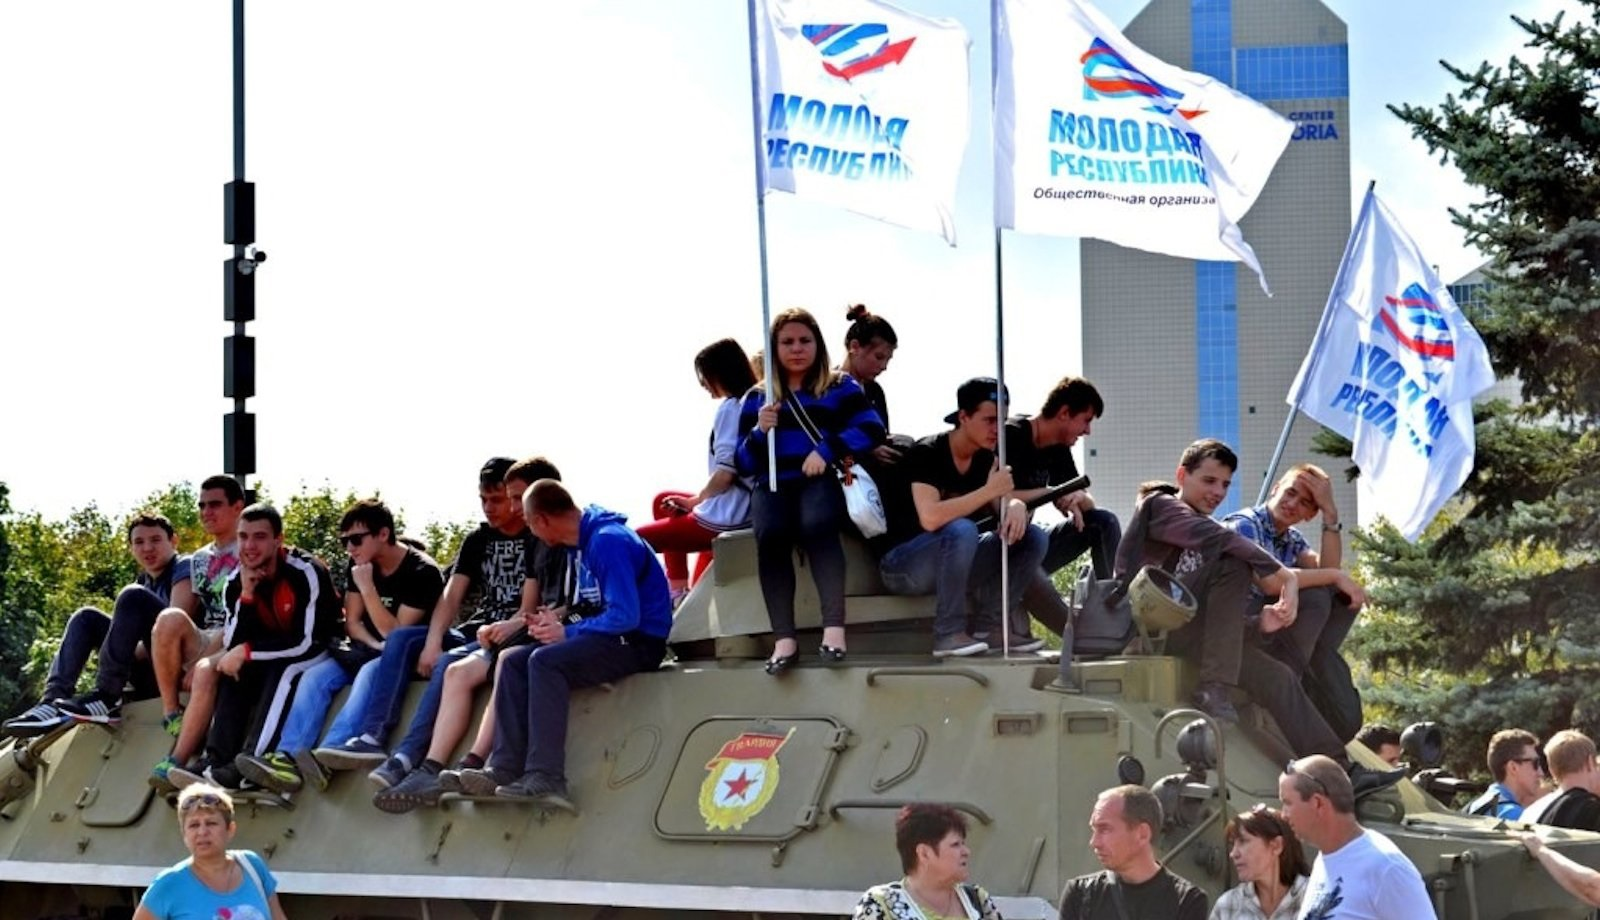 00 dnr donetsk peoples republic kids peace 04 220915